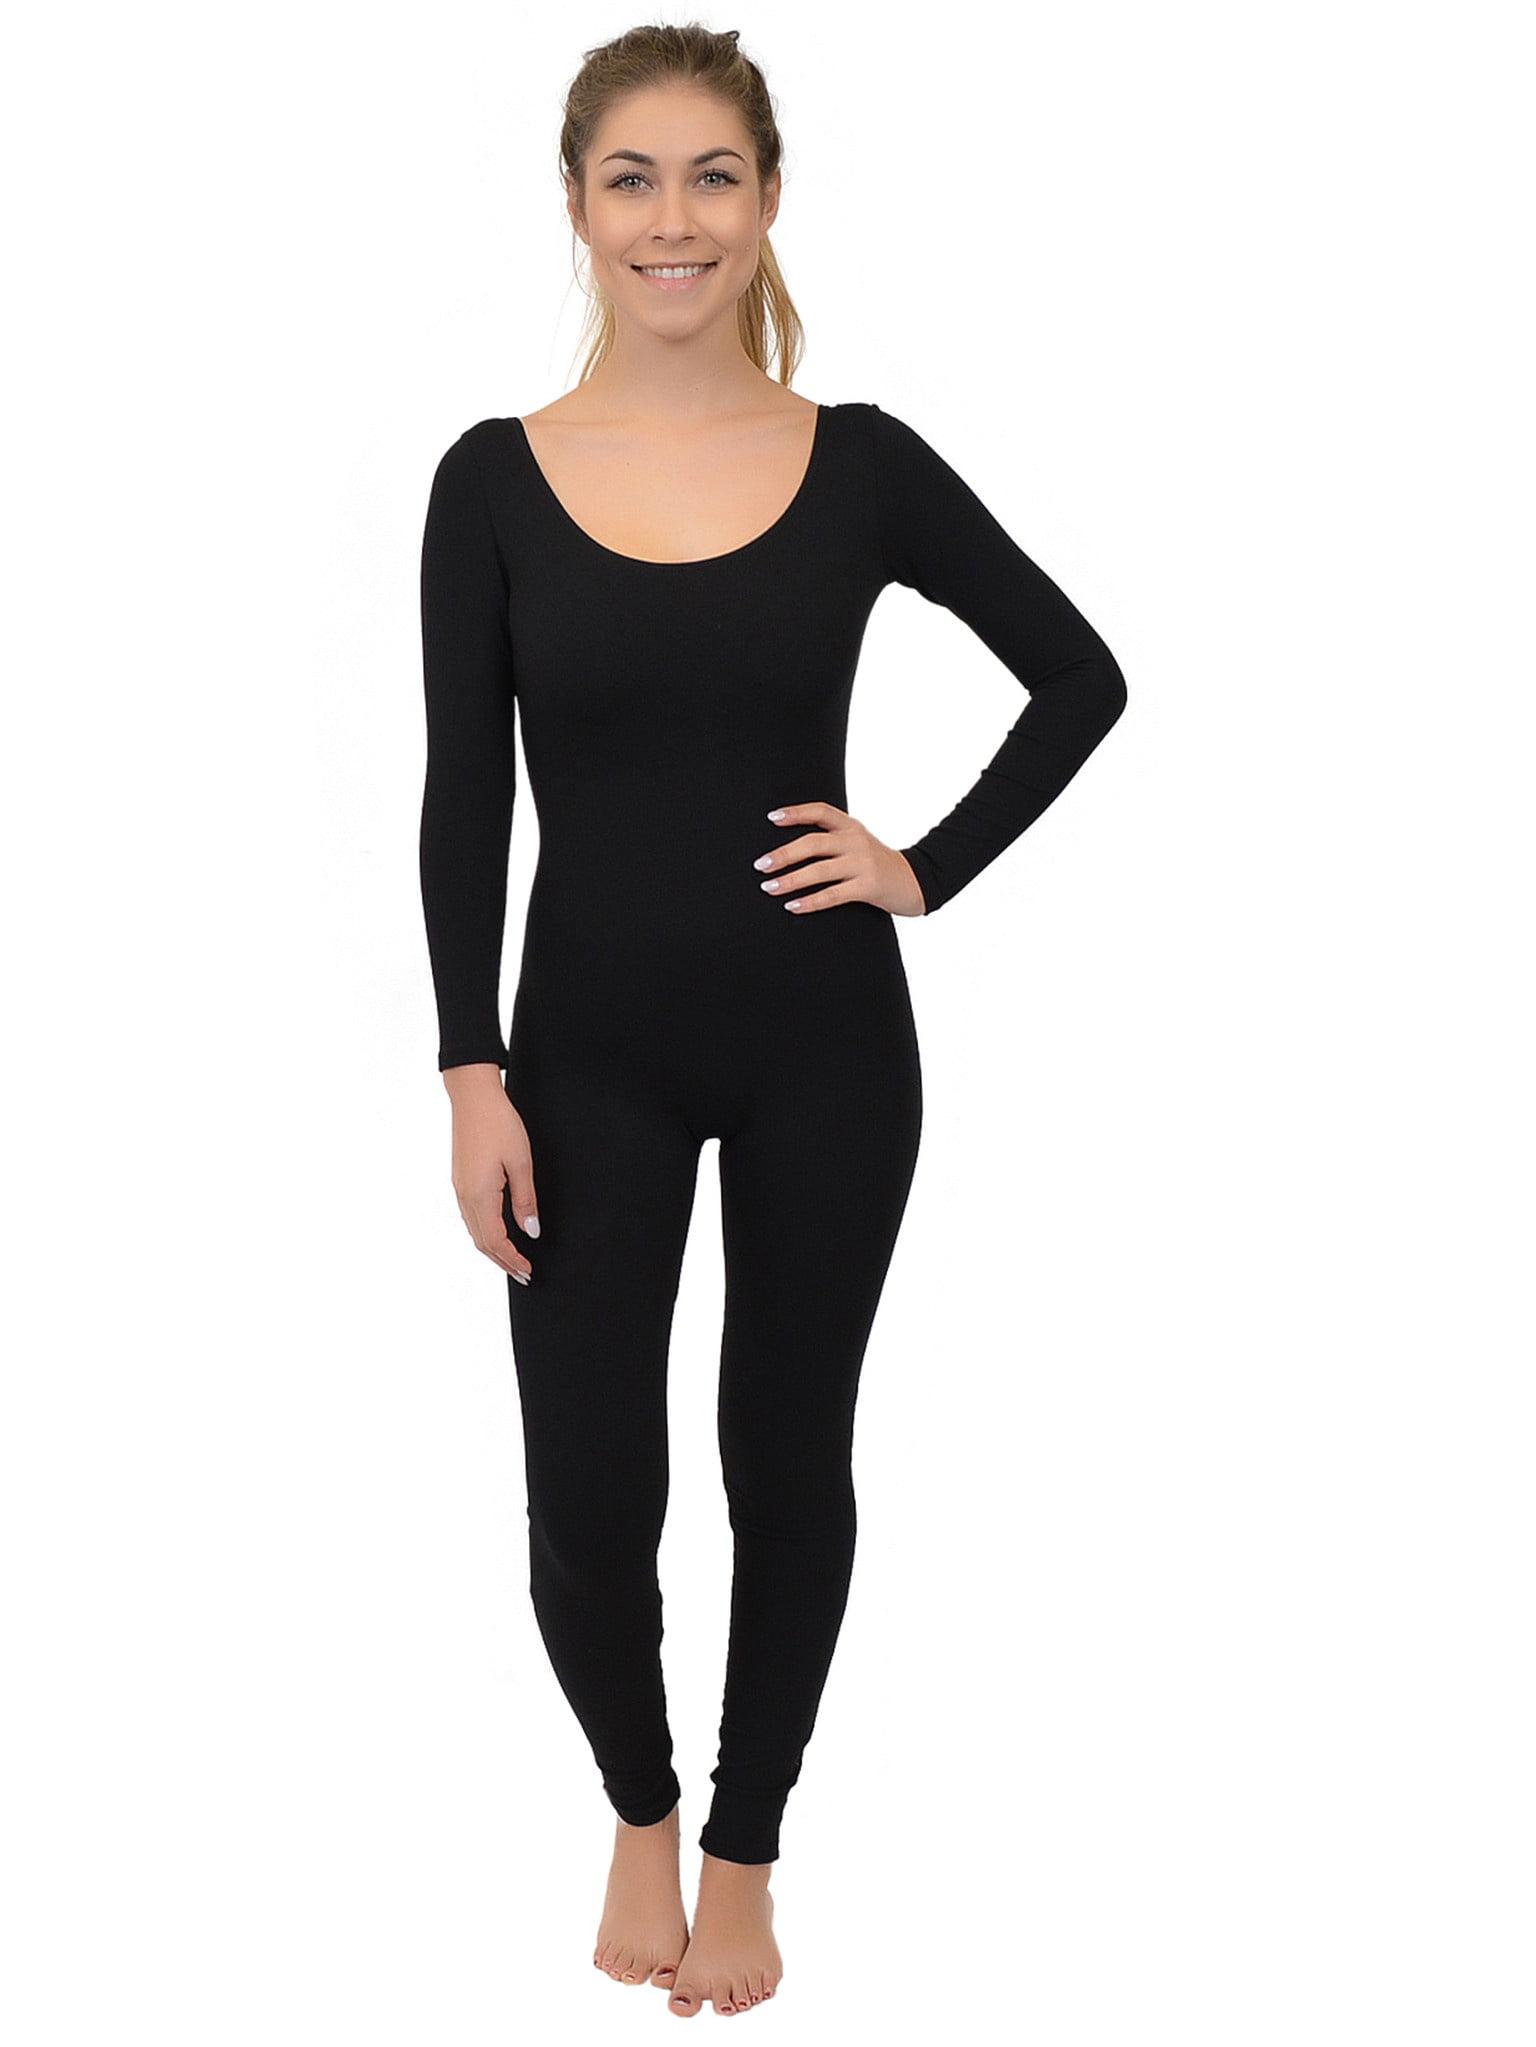 Stretch Is Comfort - Women's Long Sleeve Scoop Neck Cotton ...